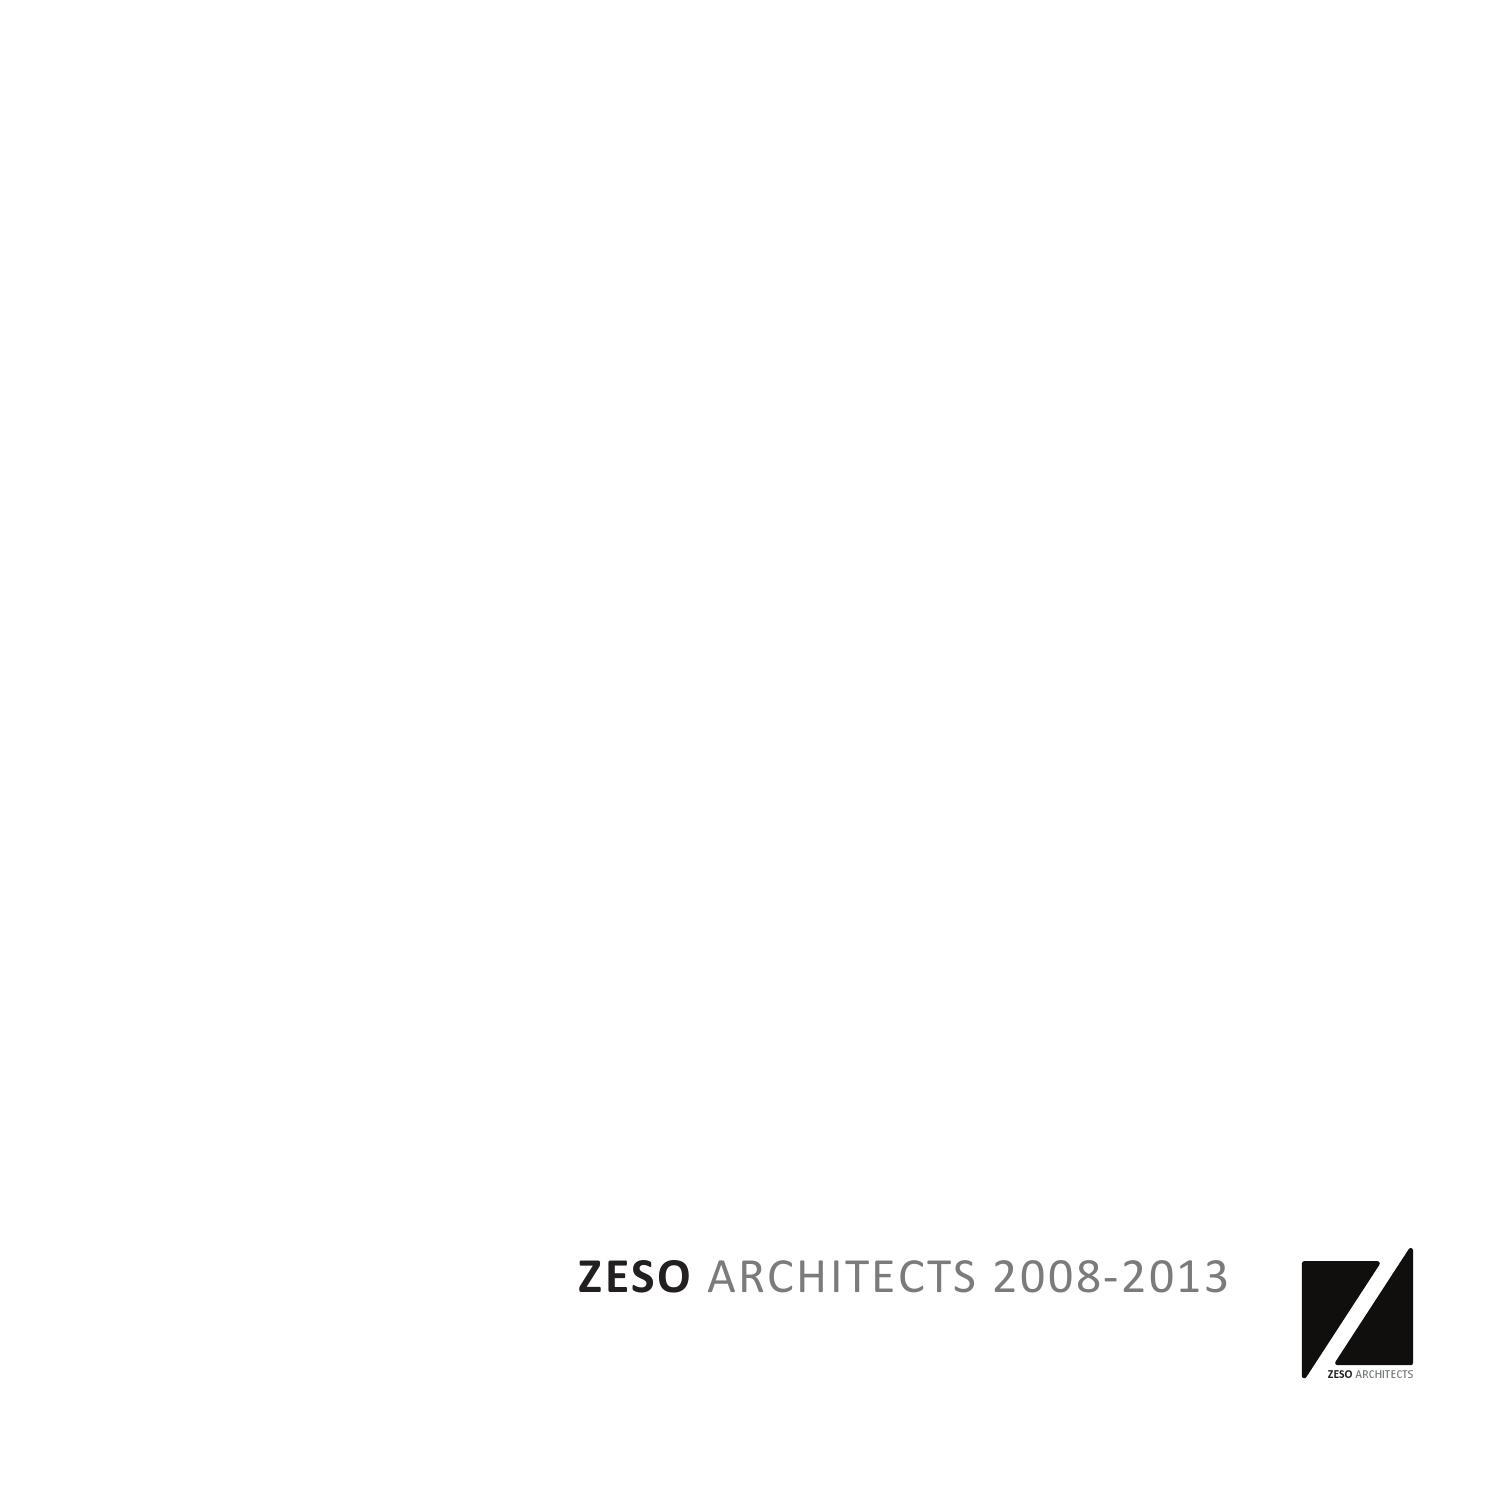 ZESO Architects 20 20 by ZESO Architects   issuu